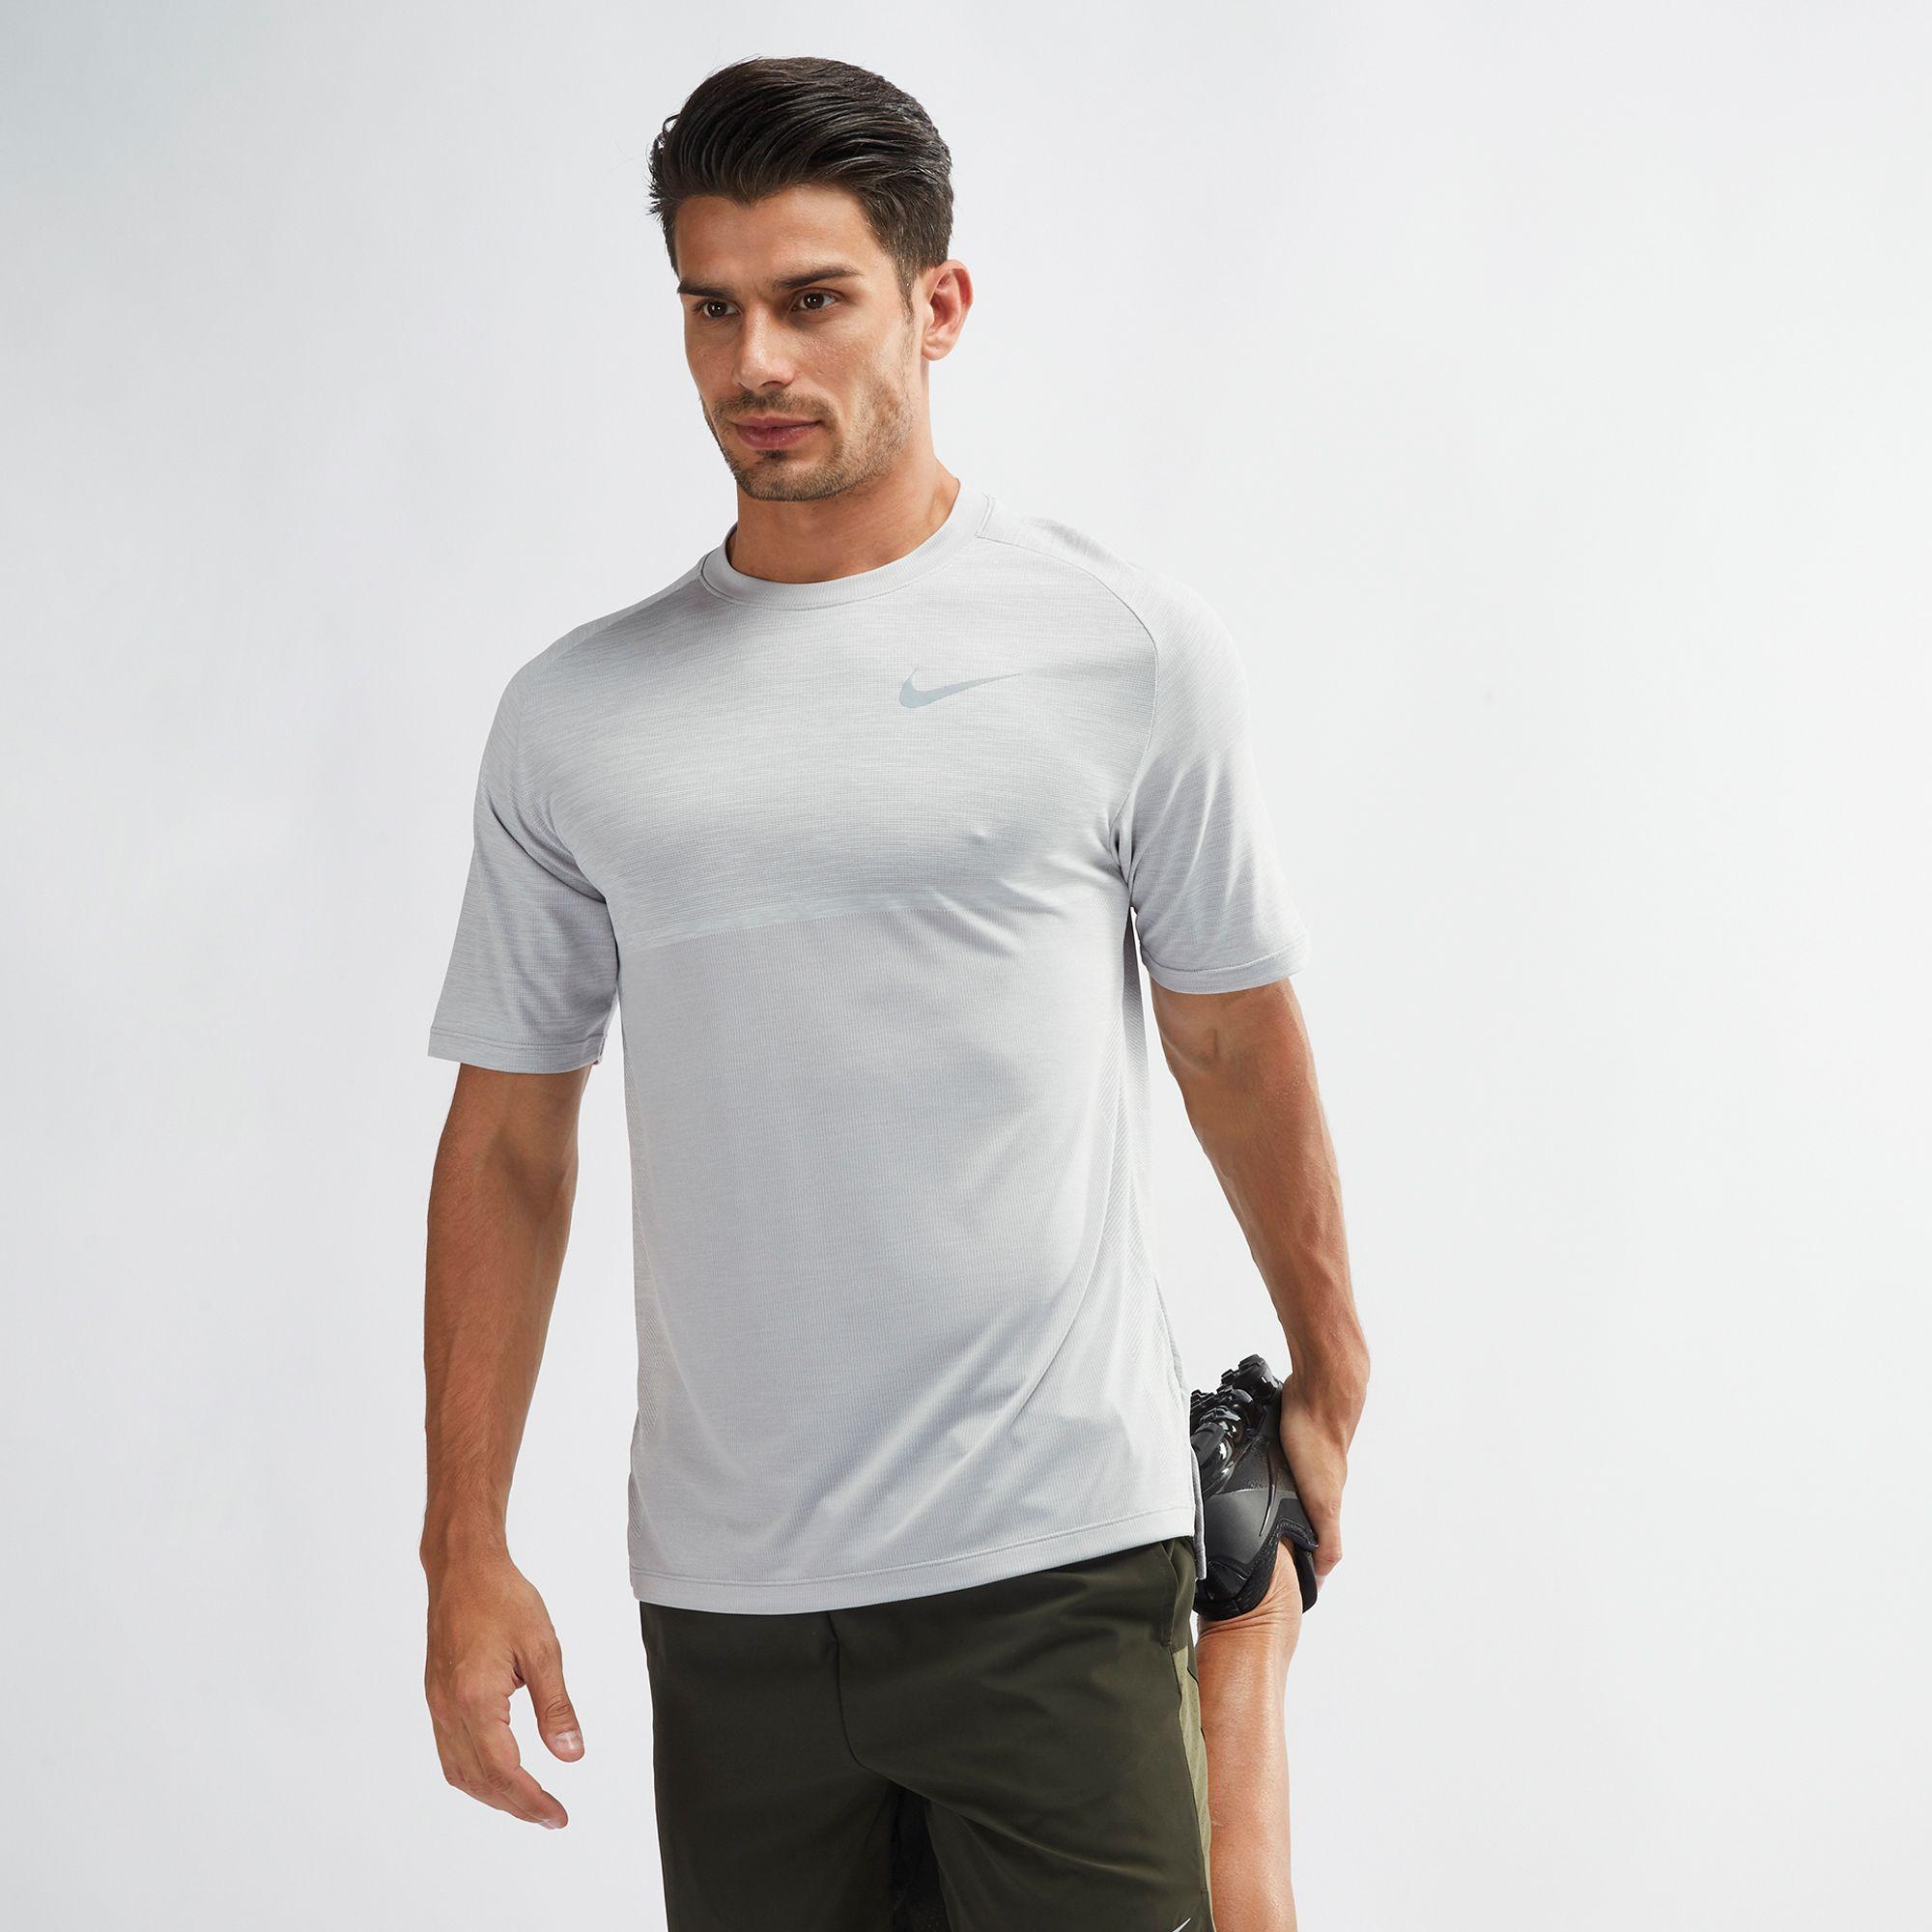 9d9b70e8 Shop Grey Nike Dri FIT Medalist Running T Shirt for Mens by Nike 8   SSS